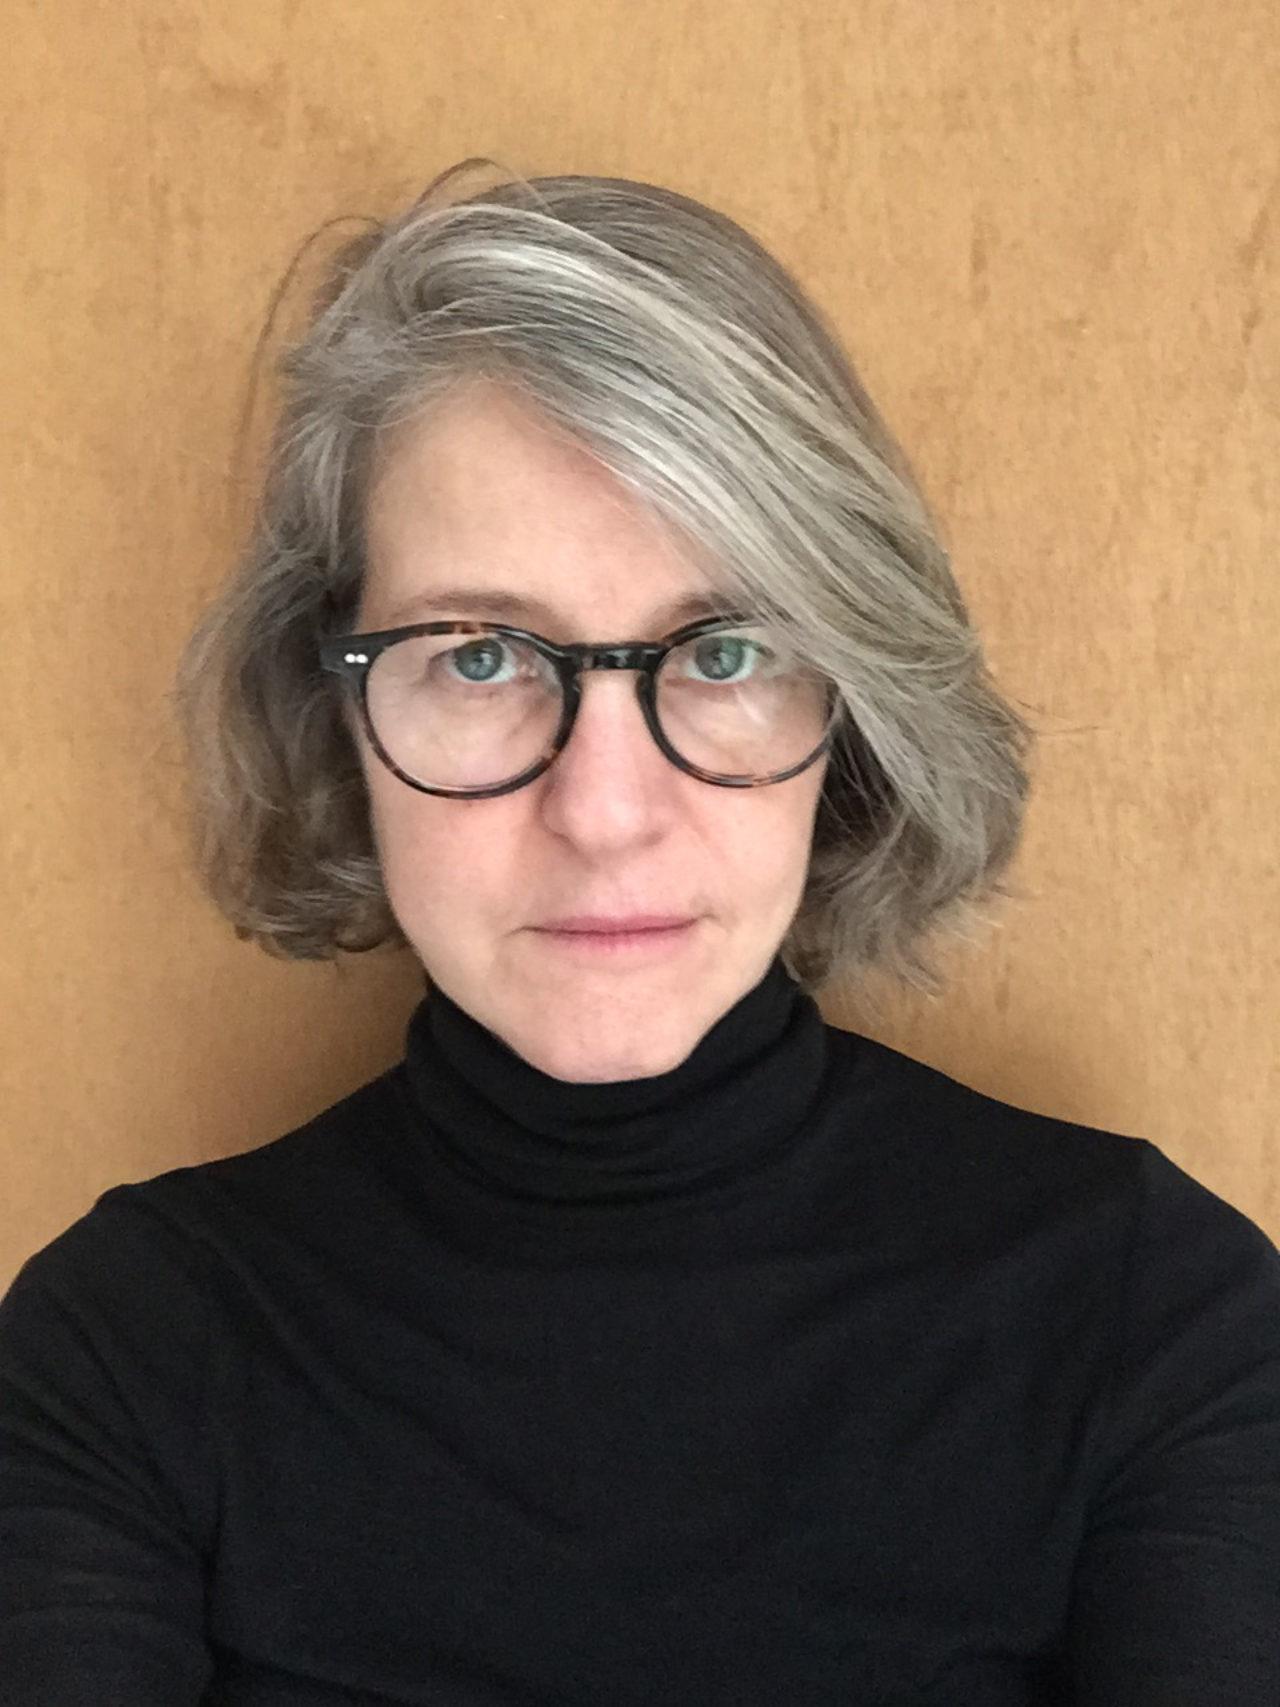 profile photo Linda van Deursen core tutor of the Master Non Linear Narrative at the KABK